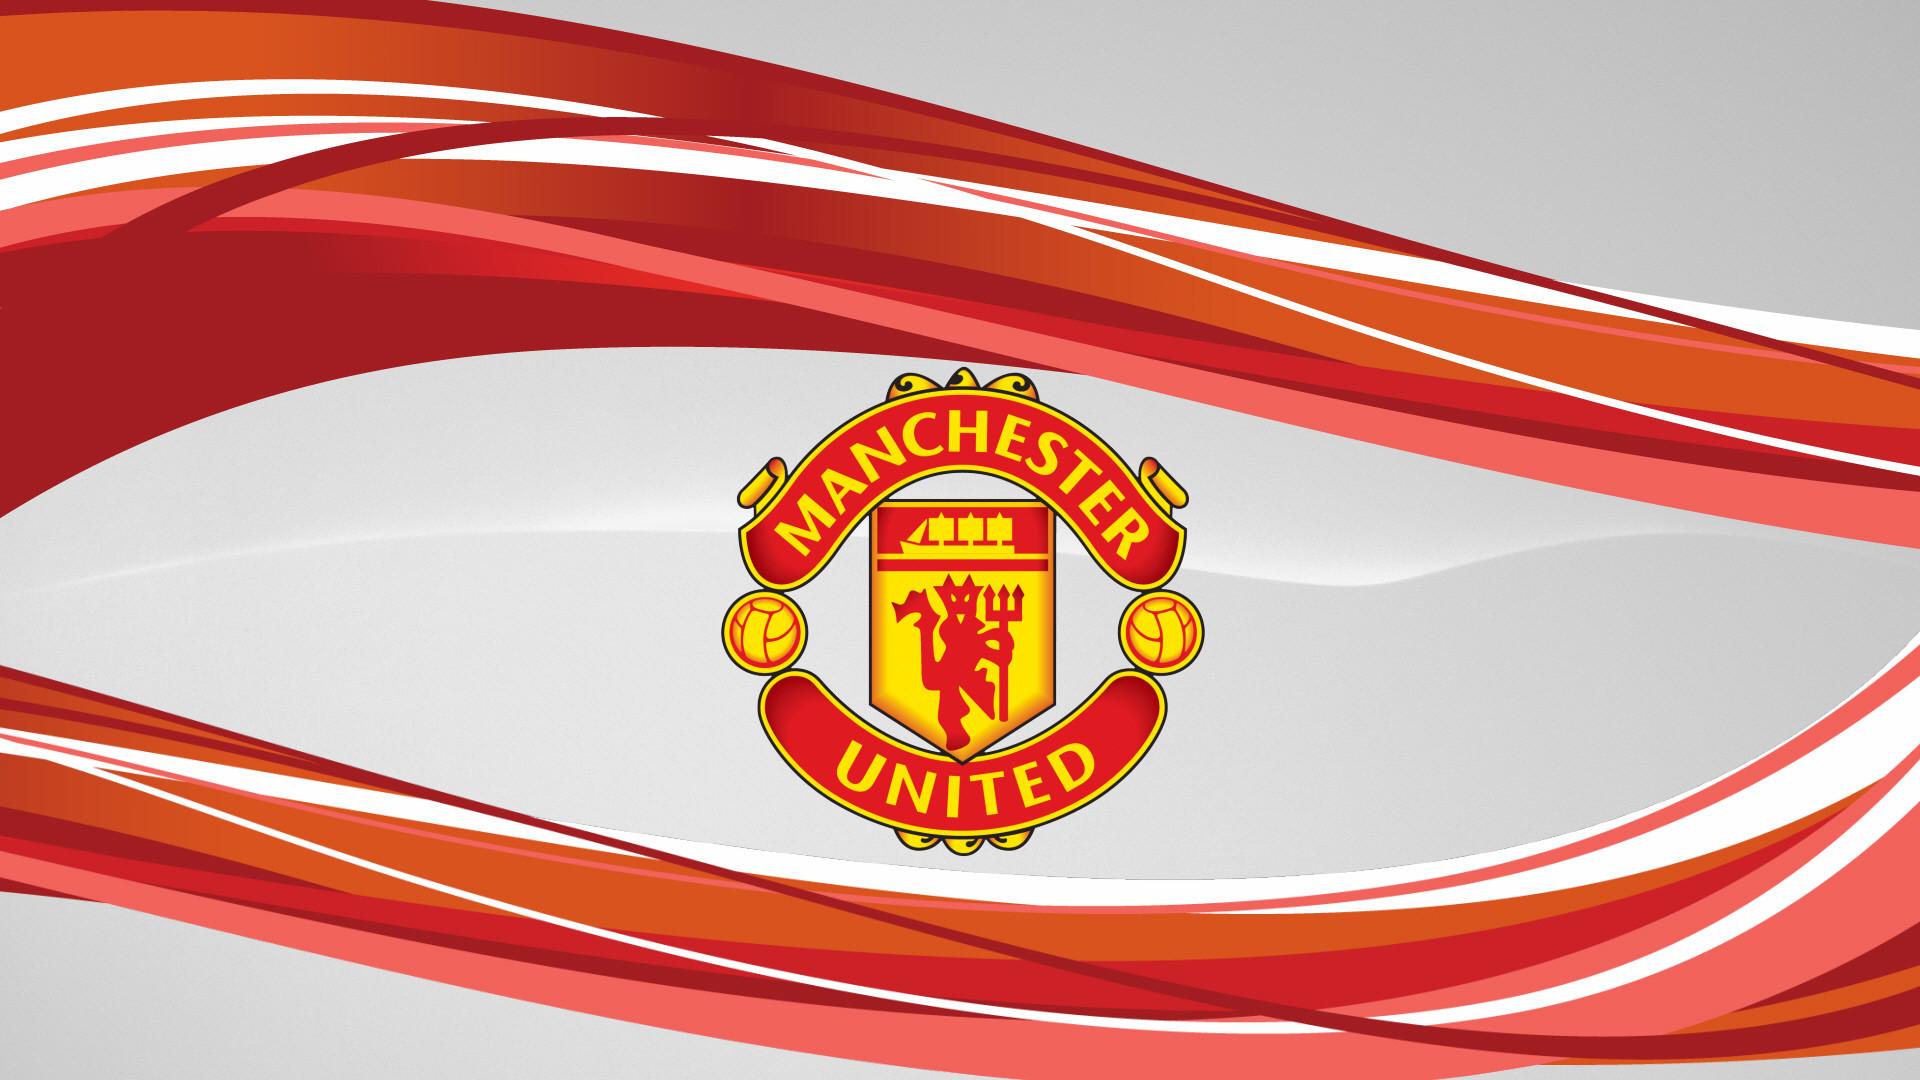 Manchester United Logo Wallpaper HD 2017 ·① WallpaperTag